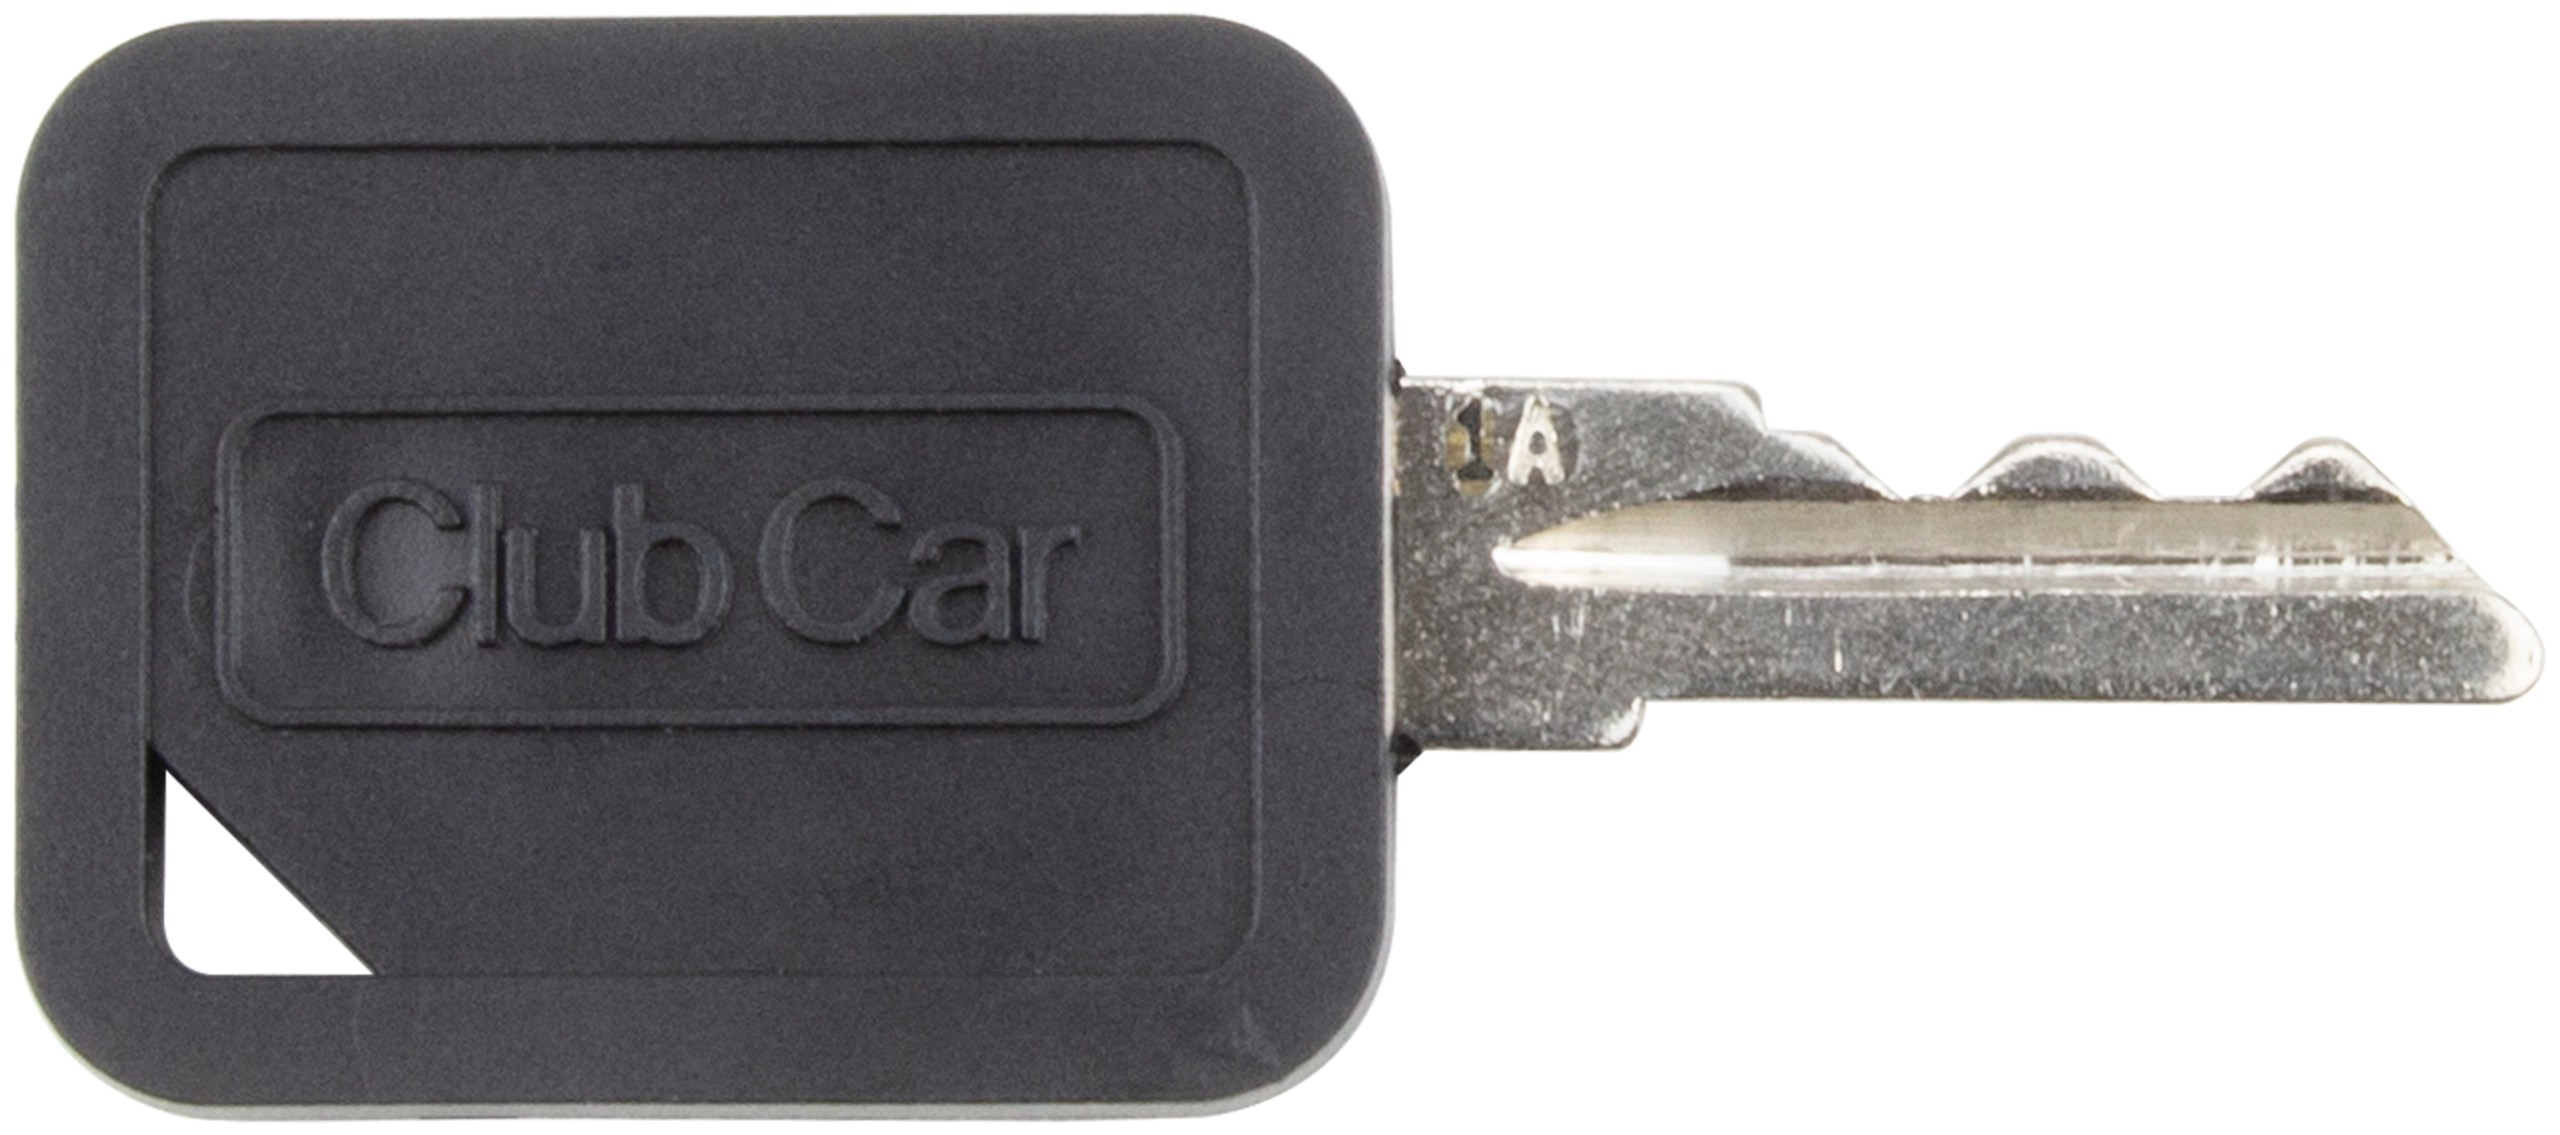 ga club car ignition switch wiring [ 2560 x 1135 Pixel ]